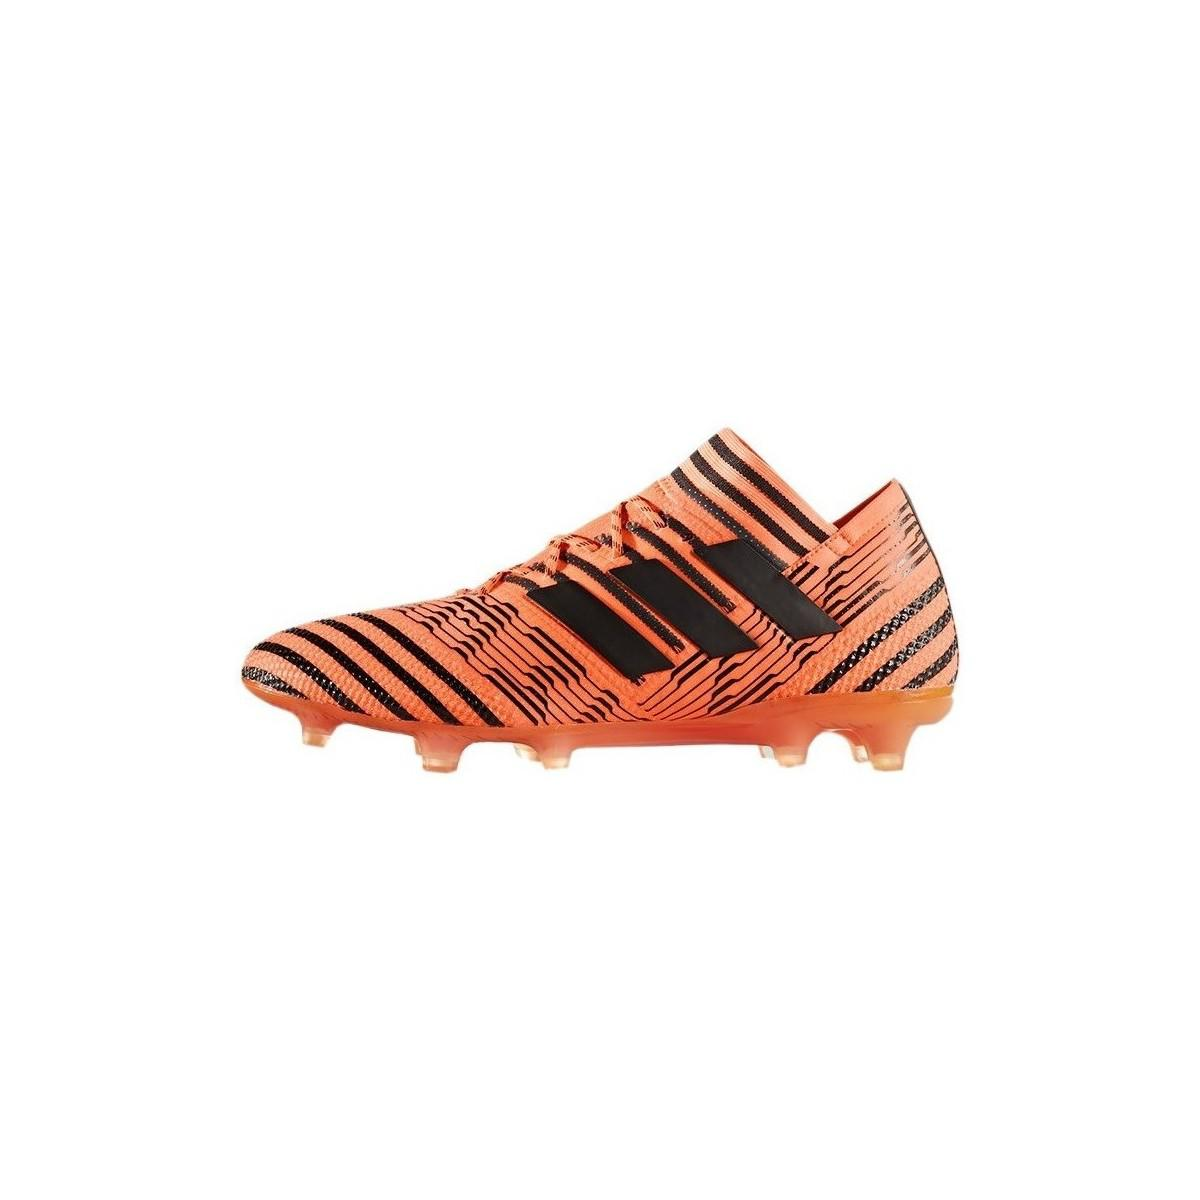 be7af1a003a Adidas Nemeziz 171 Fg Men s Football Boots In Orange in Orange for ...